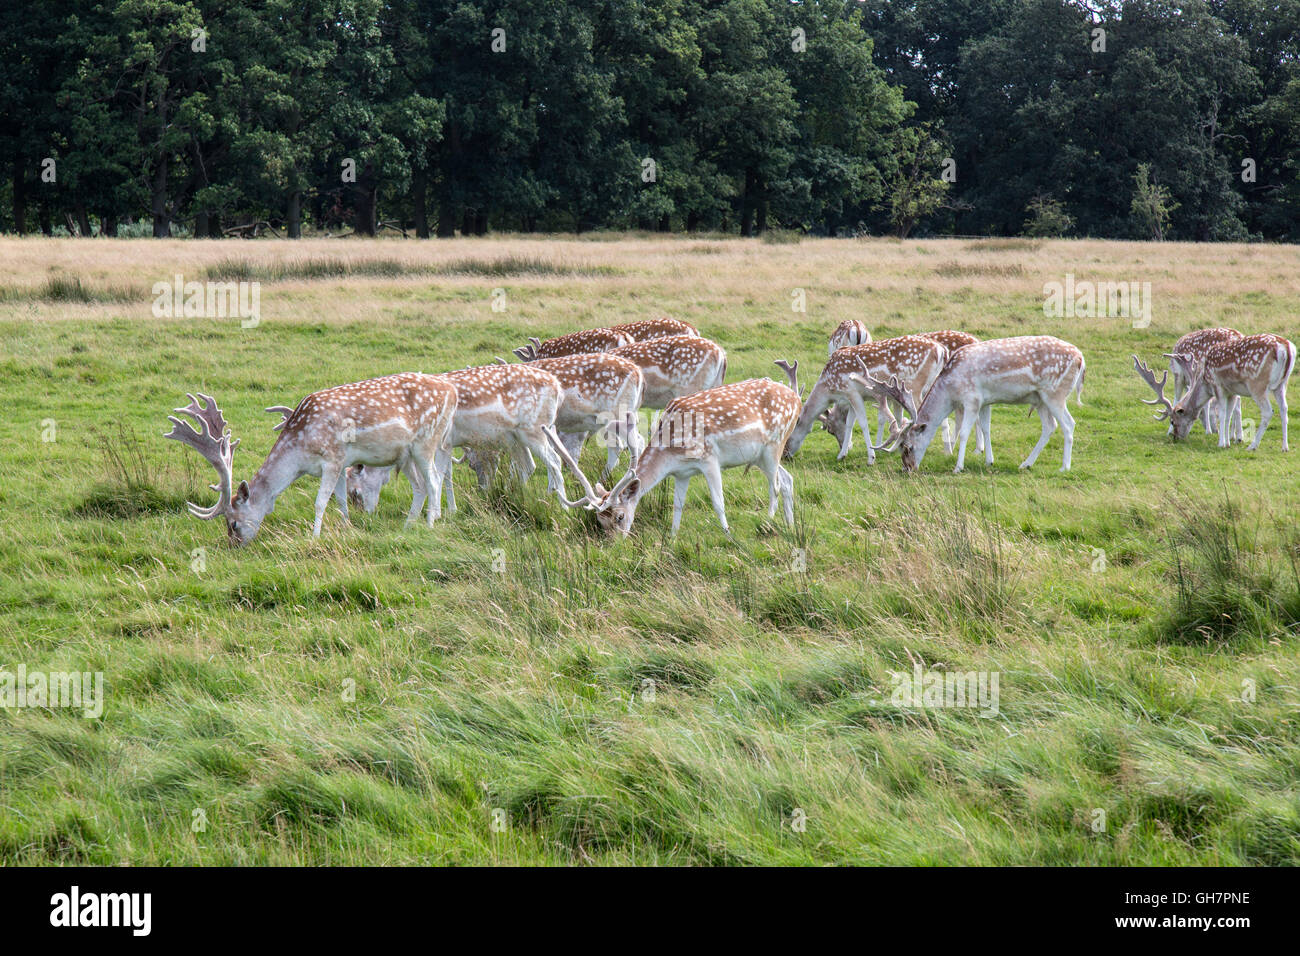 Fallow deer (Latin - Dama Dama), in England. - Stock Image